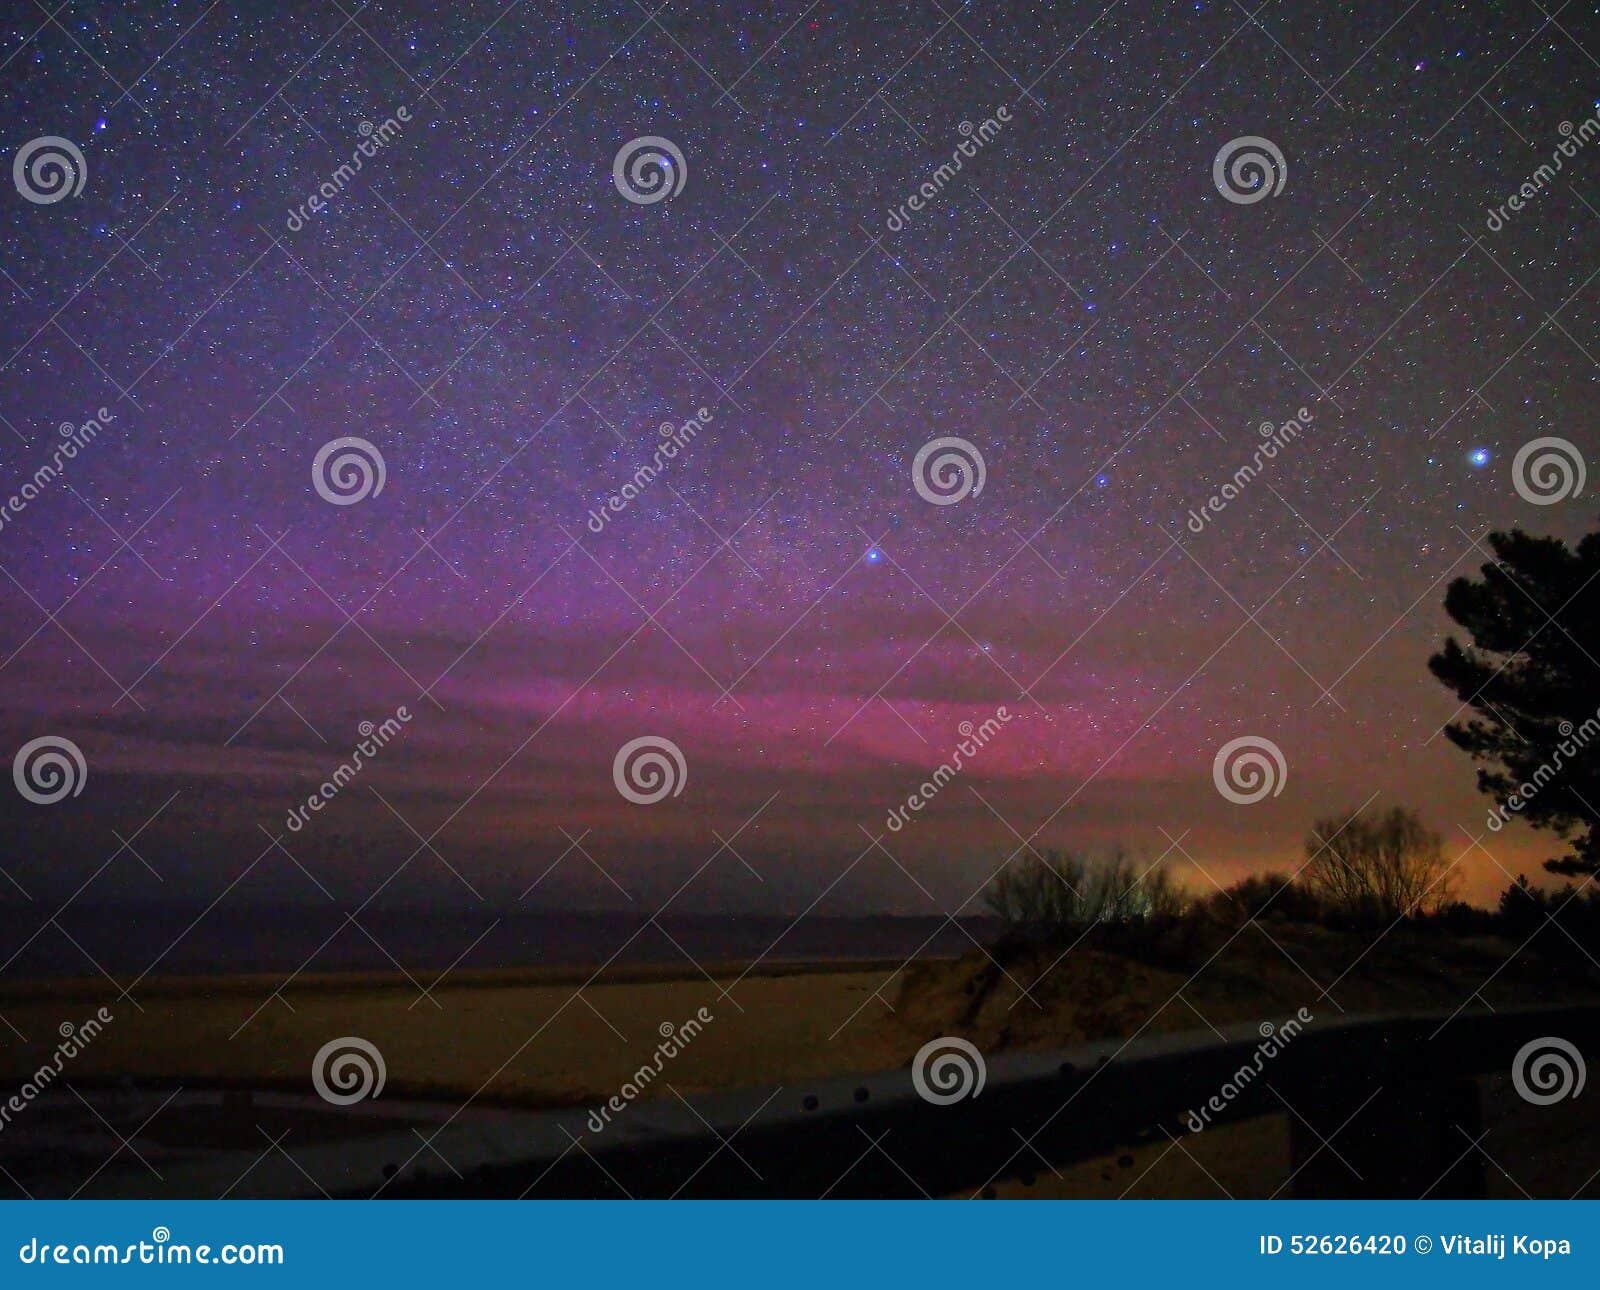 Stars and aurora borealis polar lights